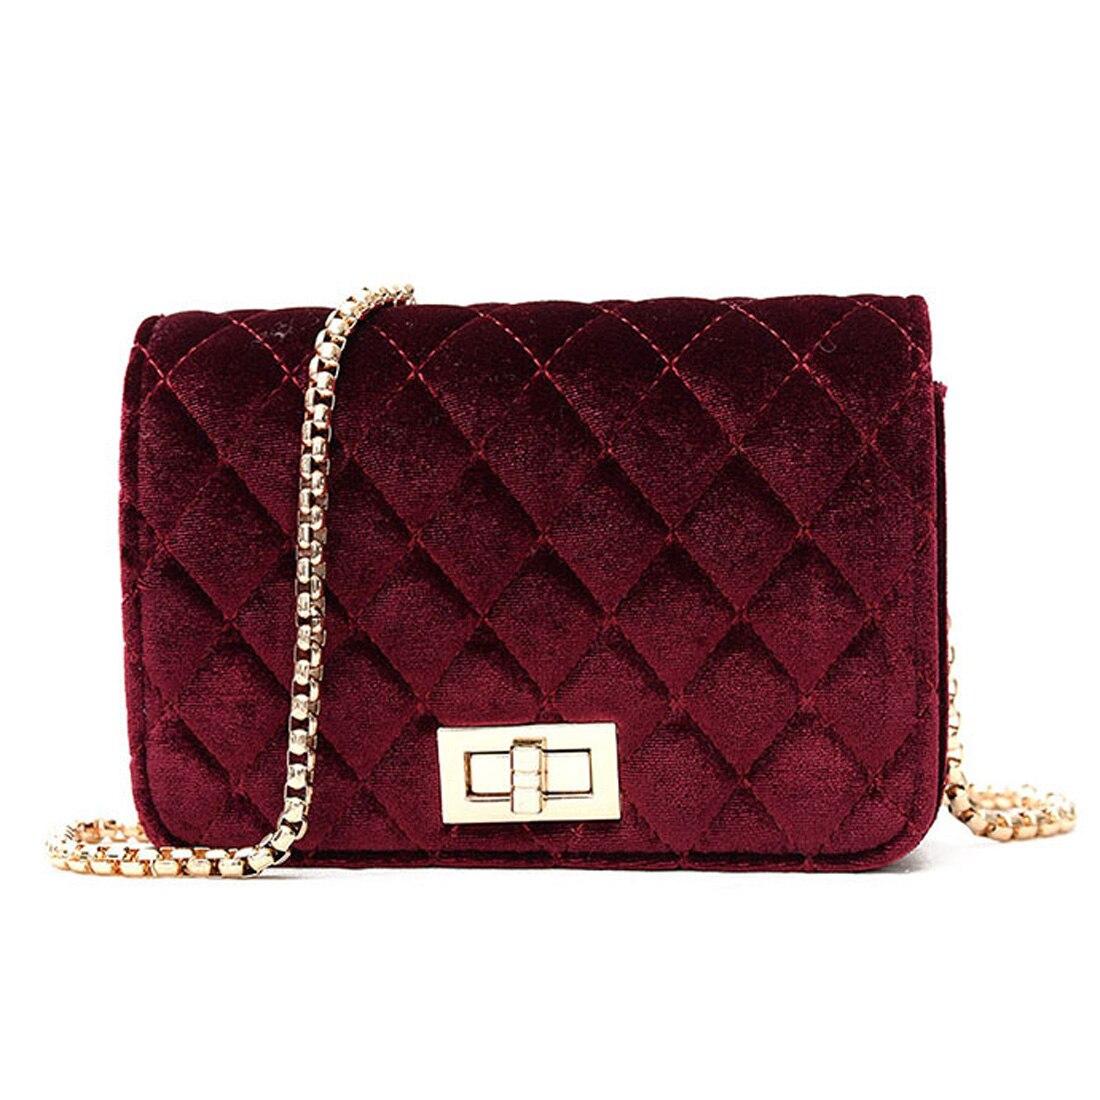 2017 Velour Frauen Crossbody Tasche Luxus Handtaschen Frauen Taschen Designer Marke Damendiamantgitter Kette Schulter/messenger Bags Ausgereifte Technologien